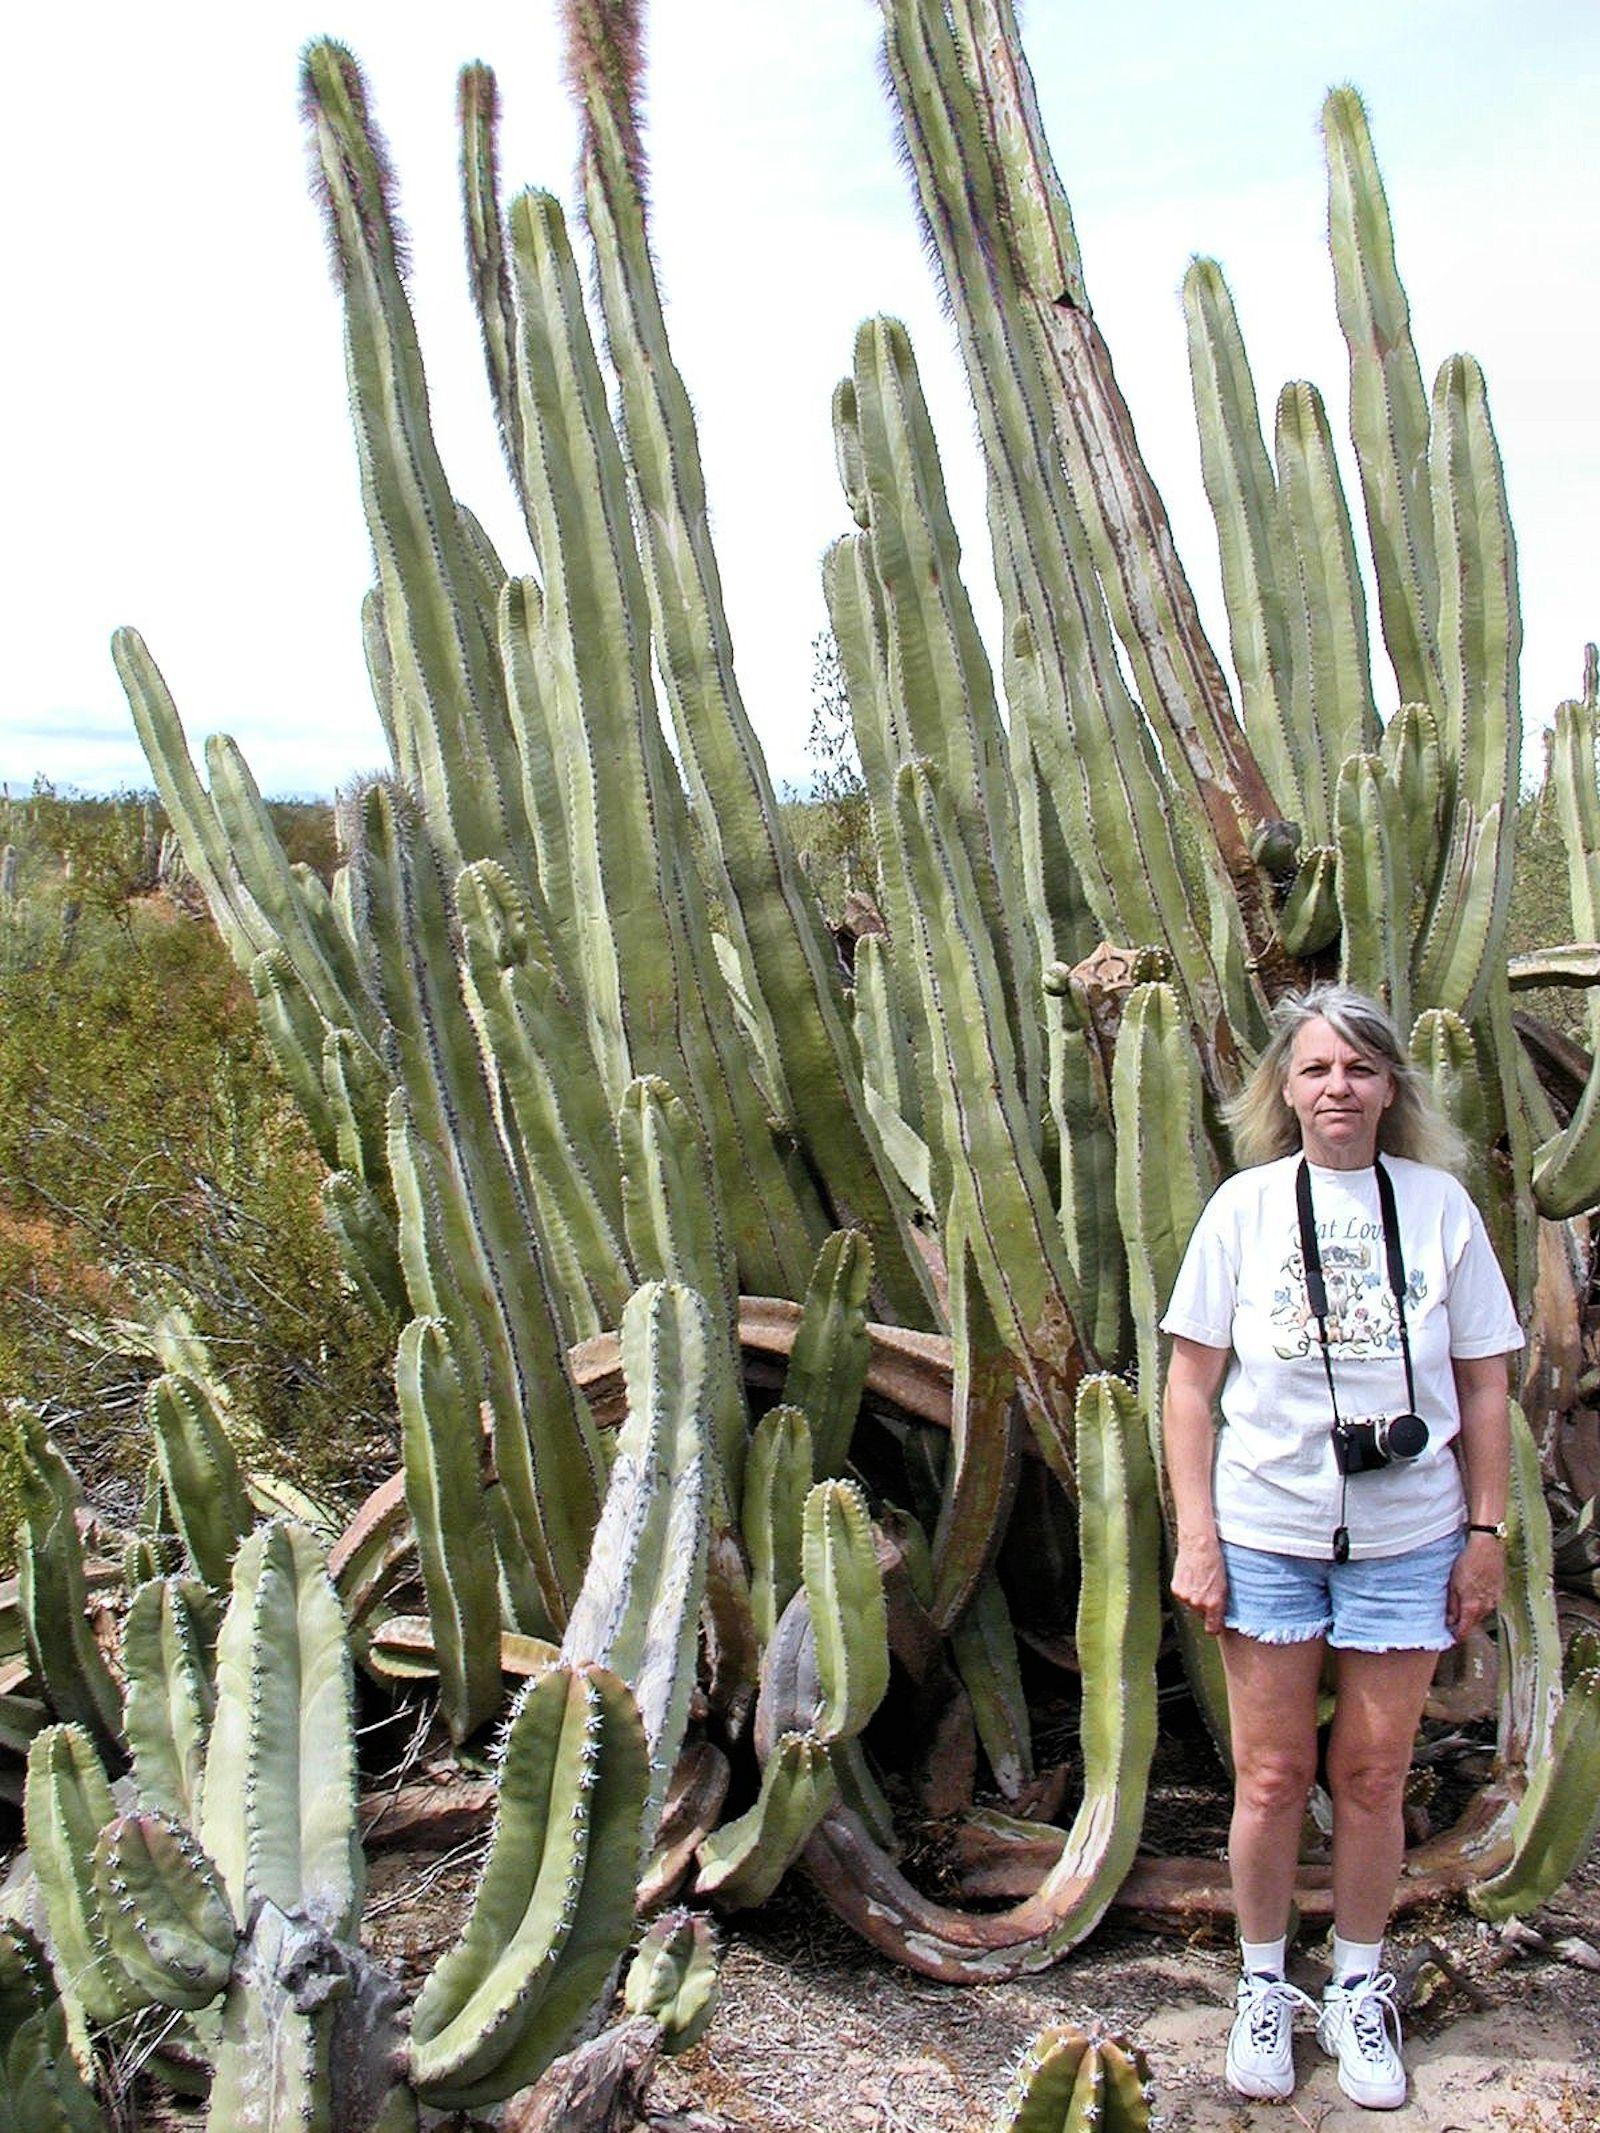 Magnifing Gl Buckhorn Cactus